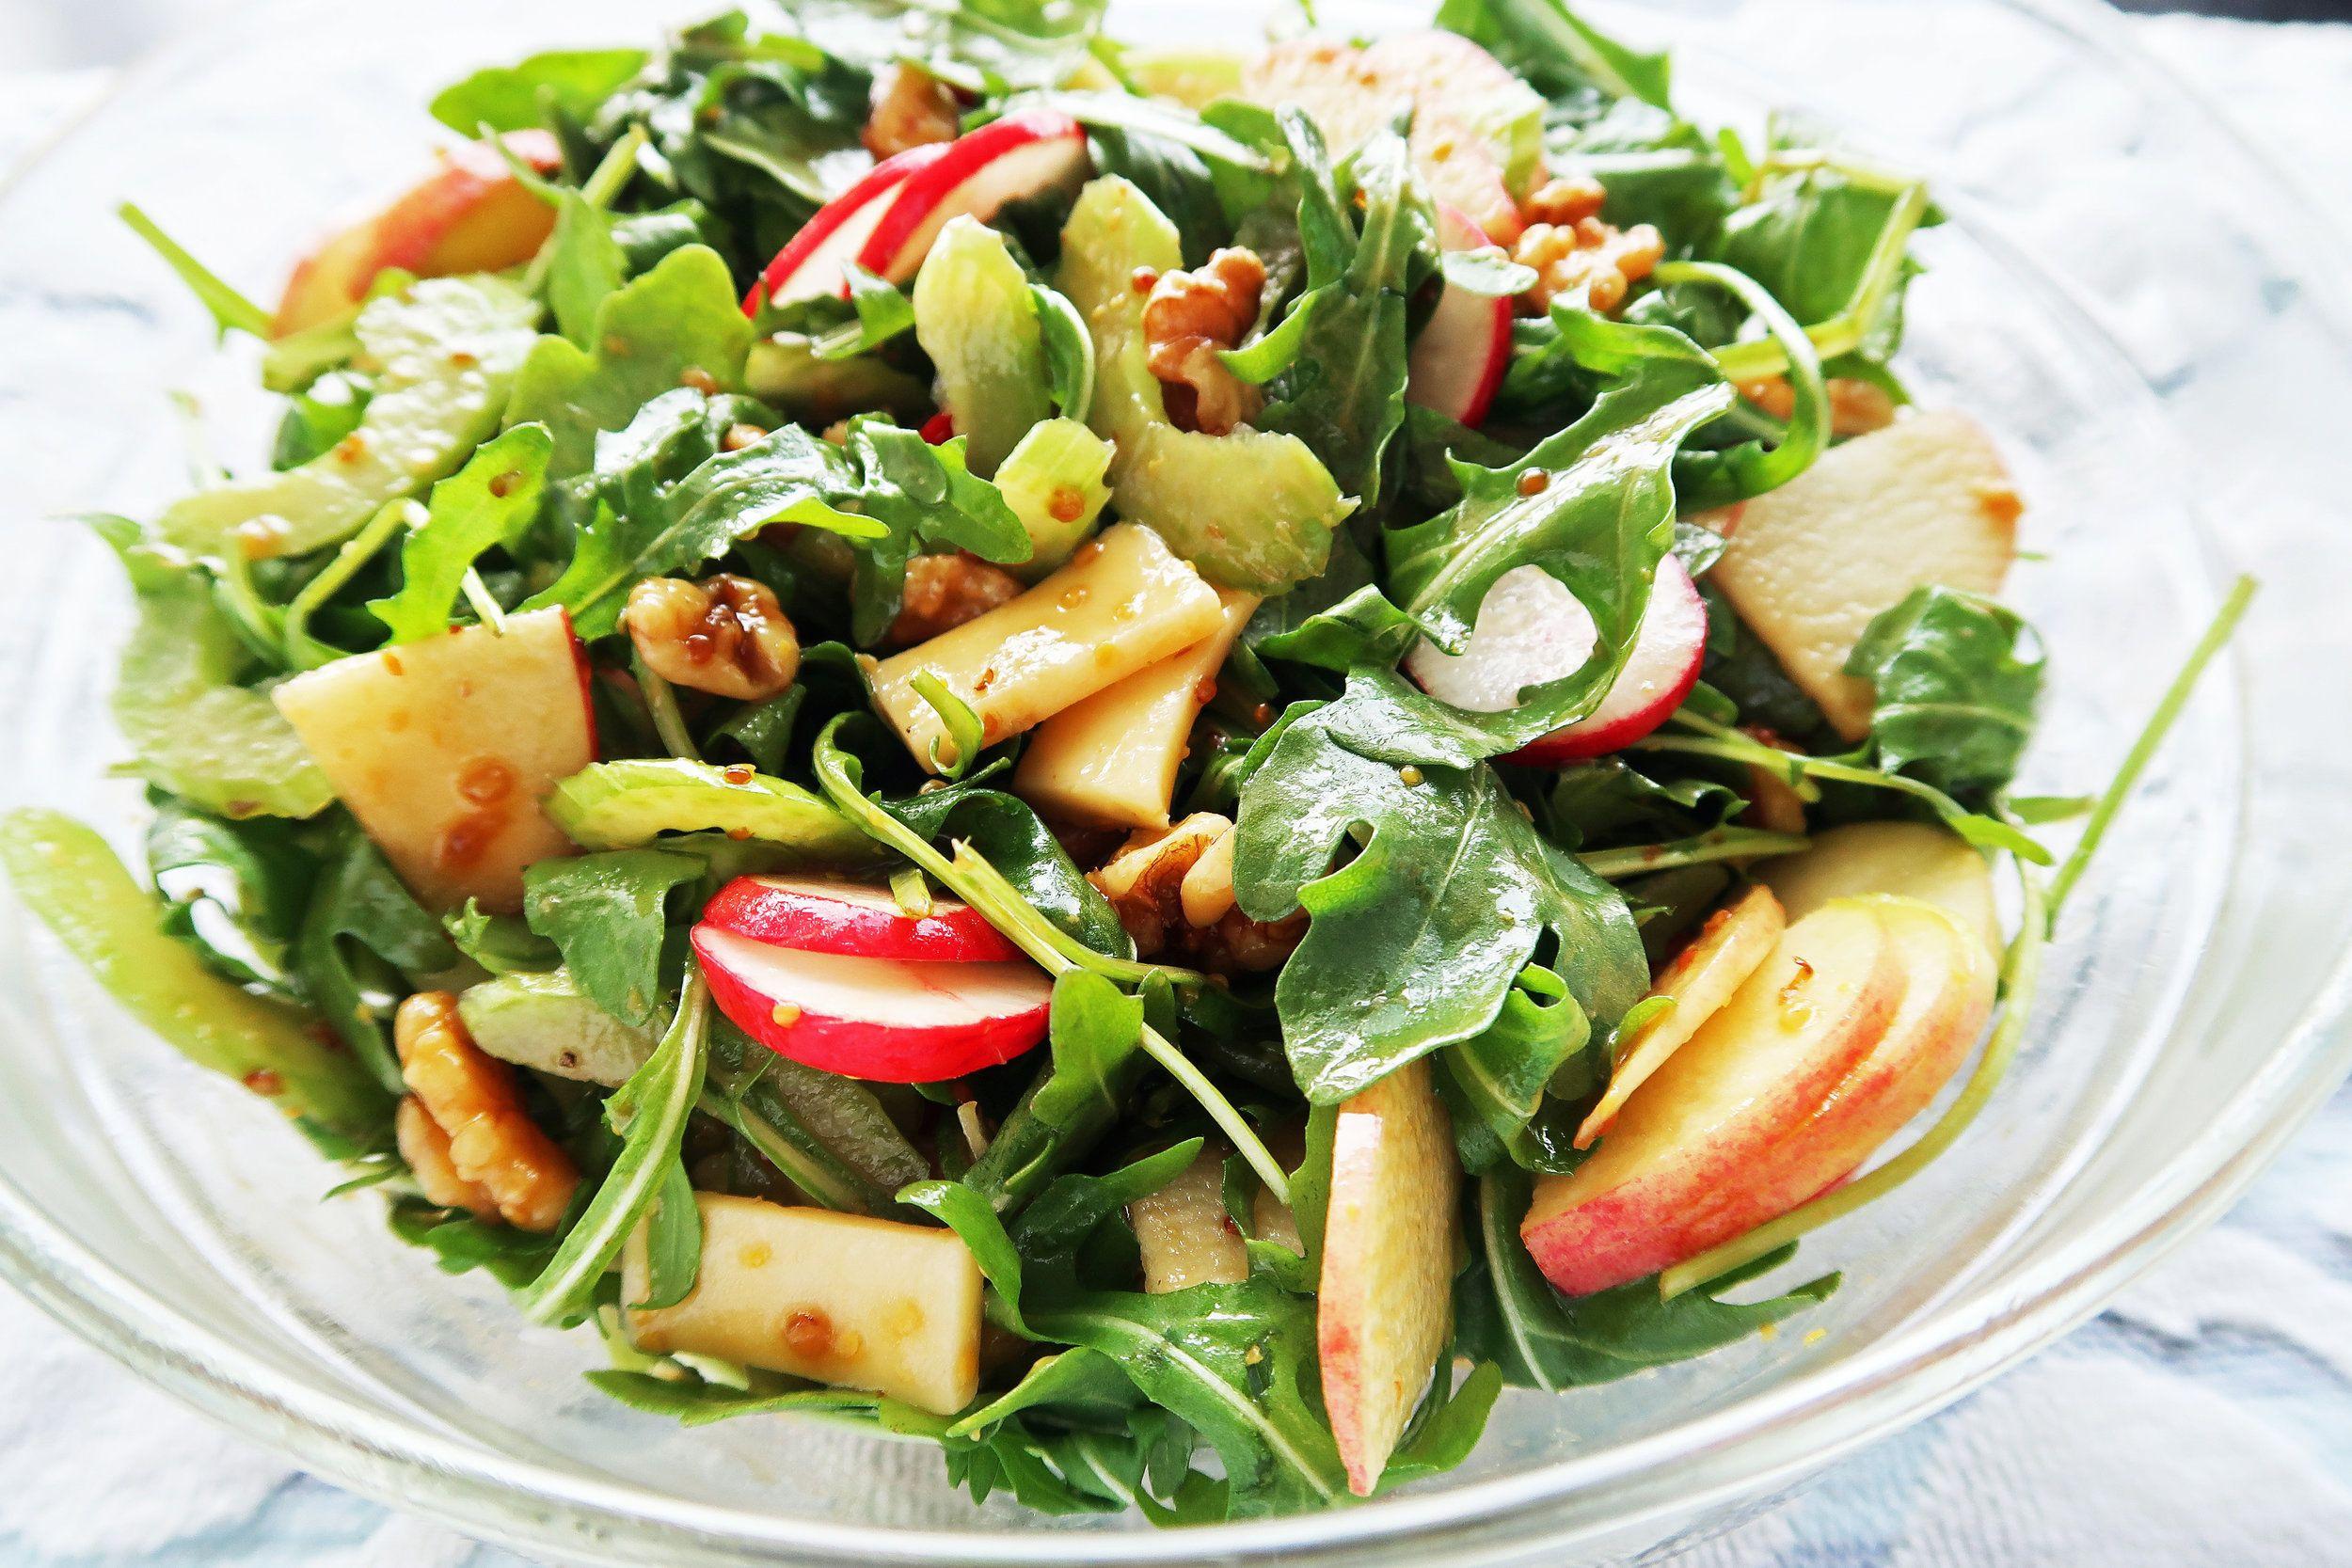 Heart Healthy Winter Recipes  Crunchy Winter Salad with Balsamic Honey Mustard Dressing